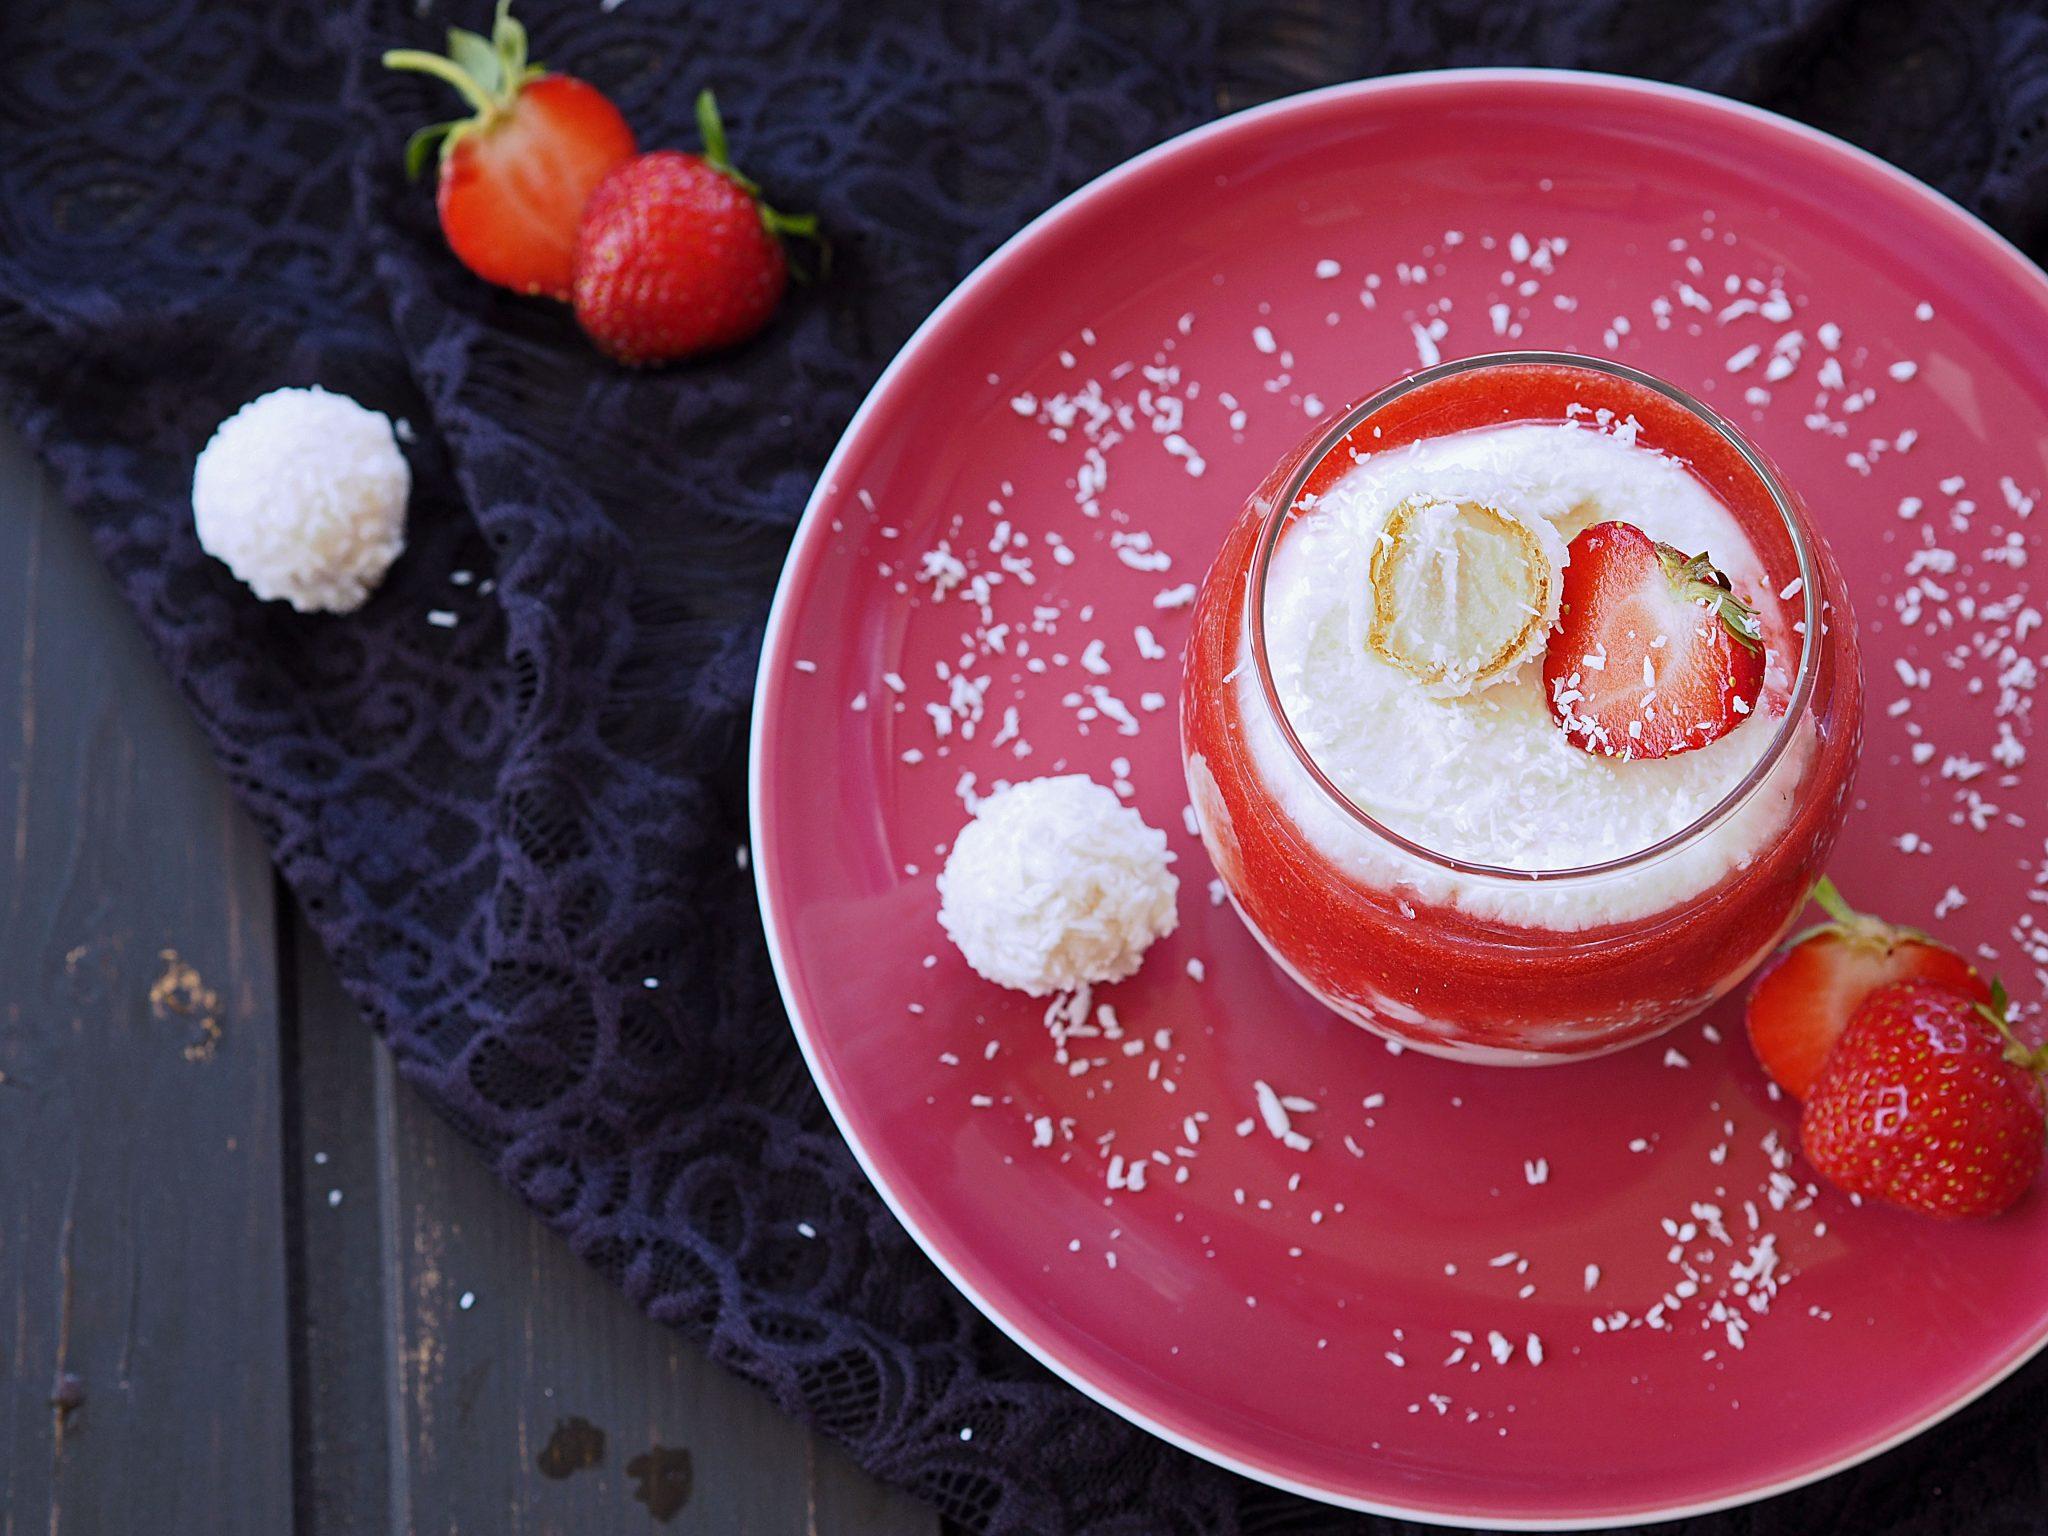 Kokosdessert mit Erdbeeren